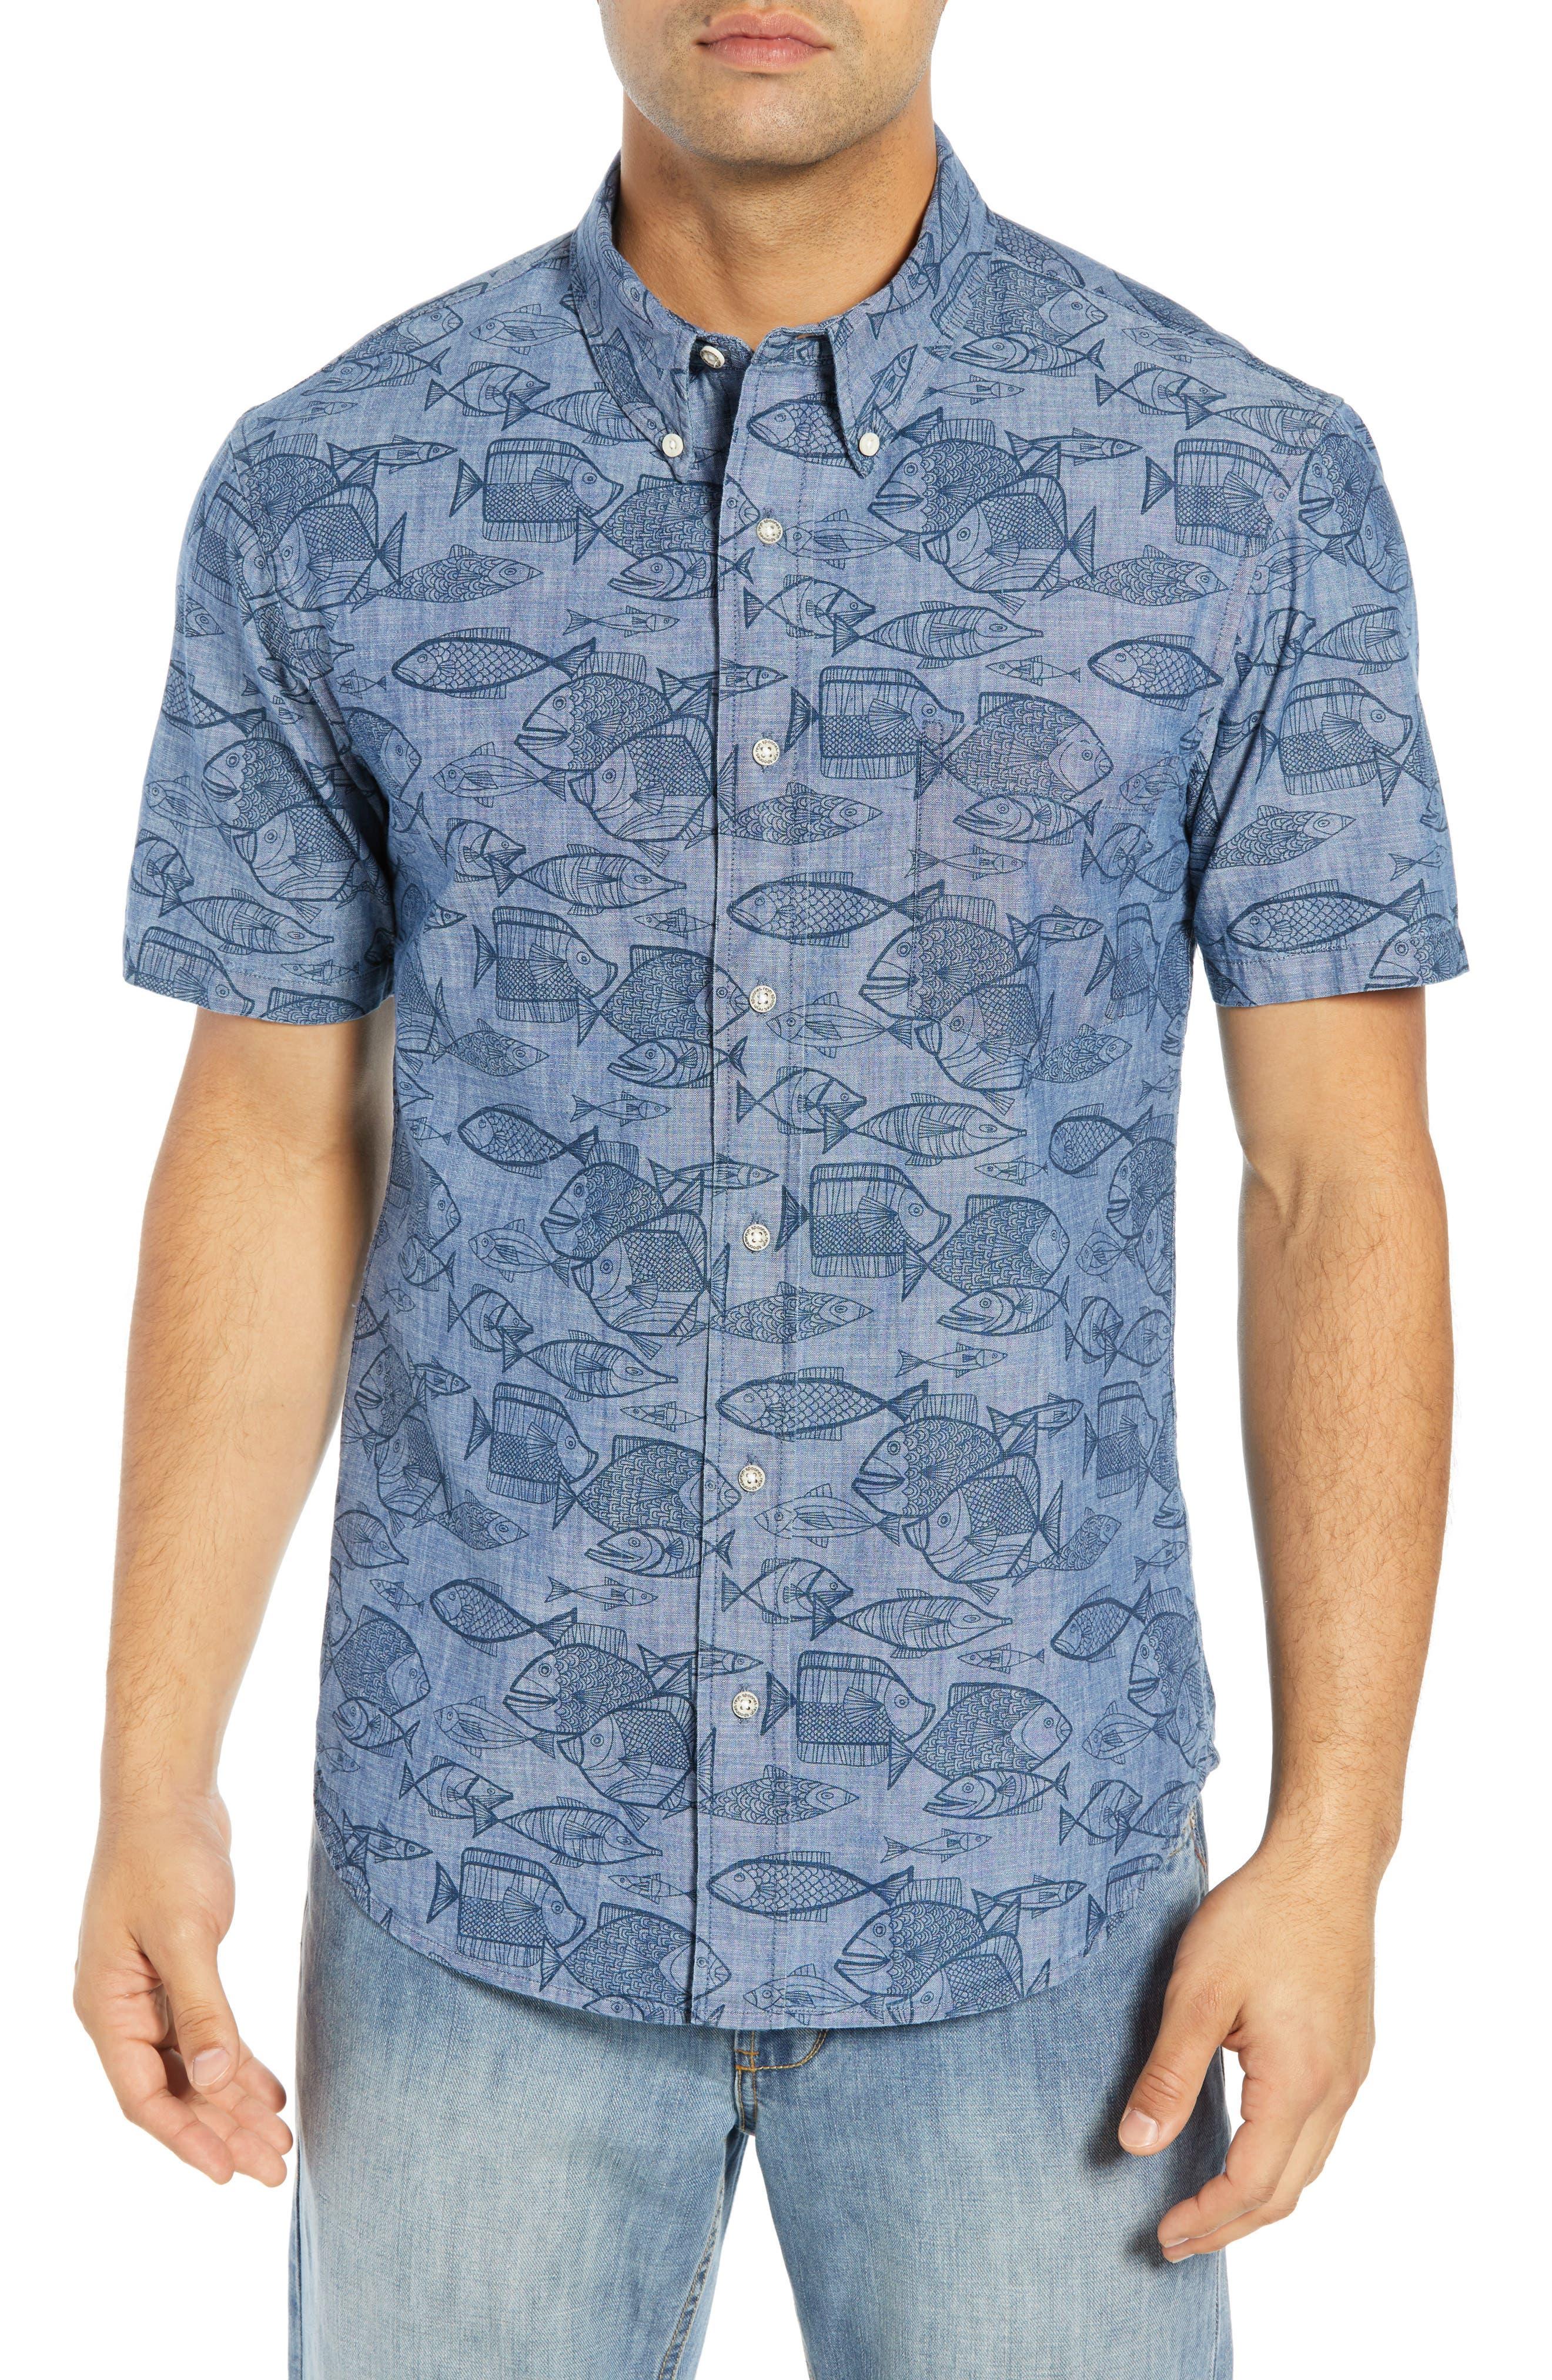 REYN SPOONER, Kauhulu Tailored Fit Sport Shirt, Main thumbnail 1, color, CHAMBRAY BLUE